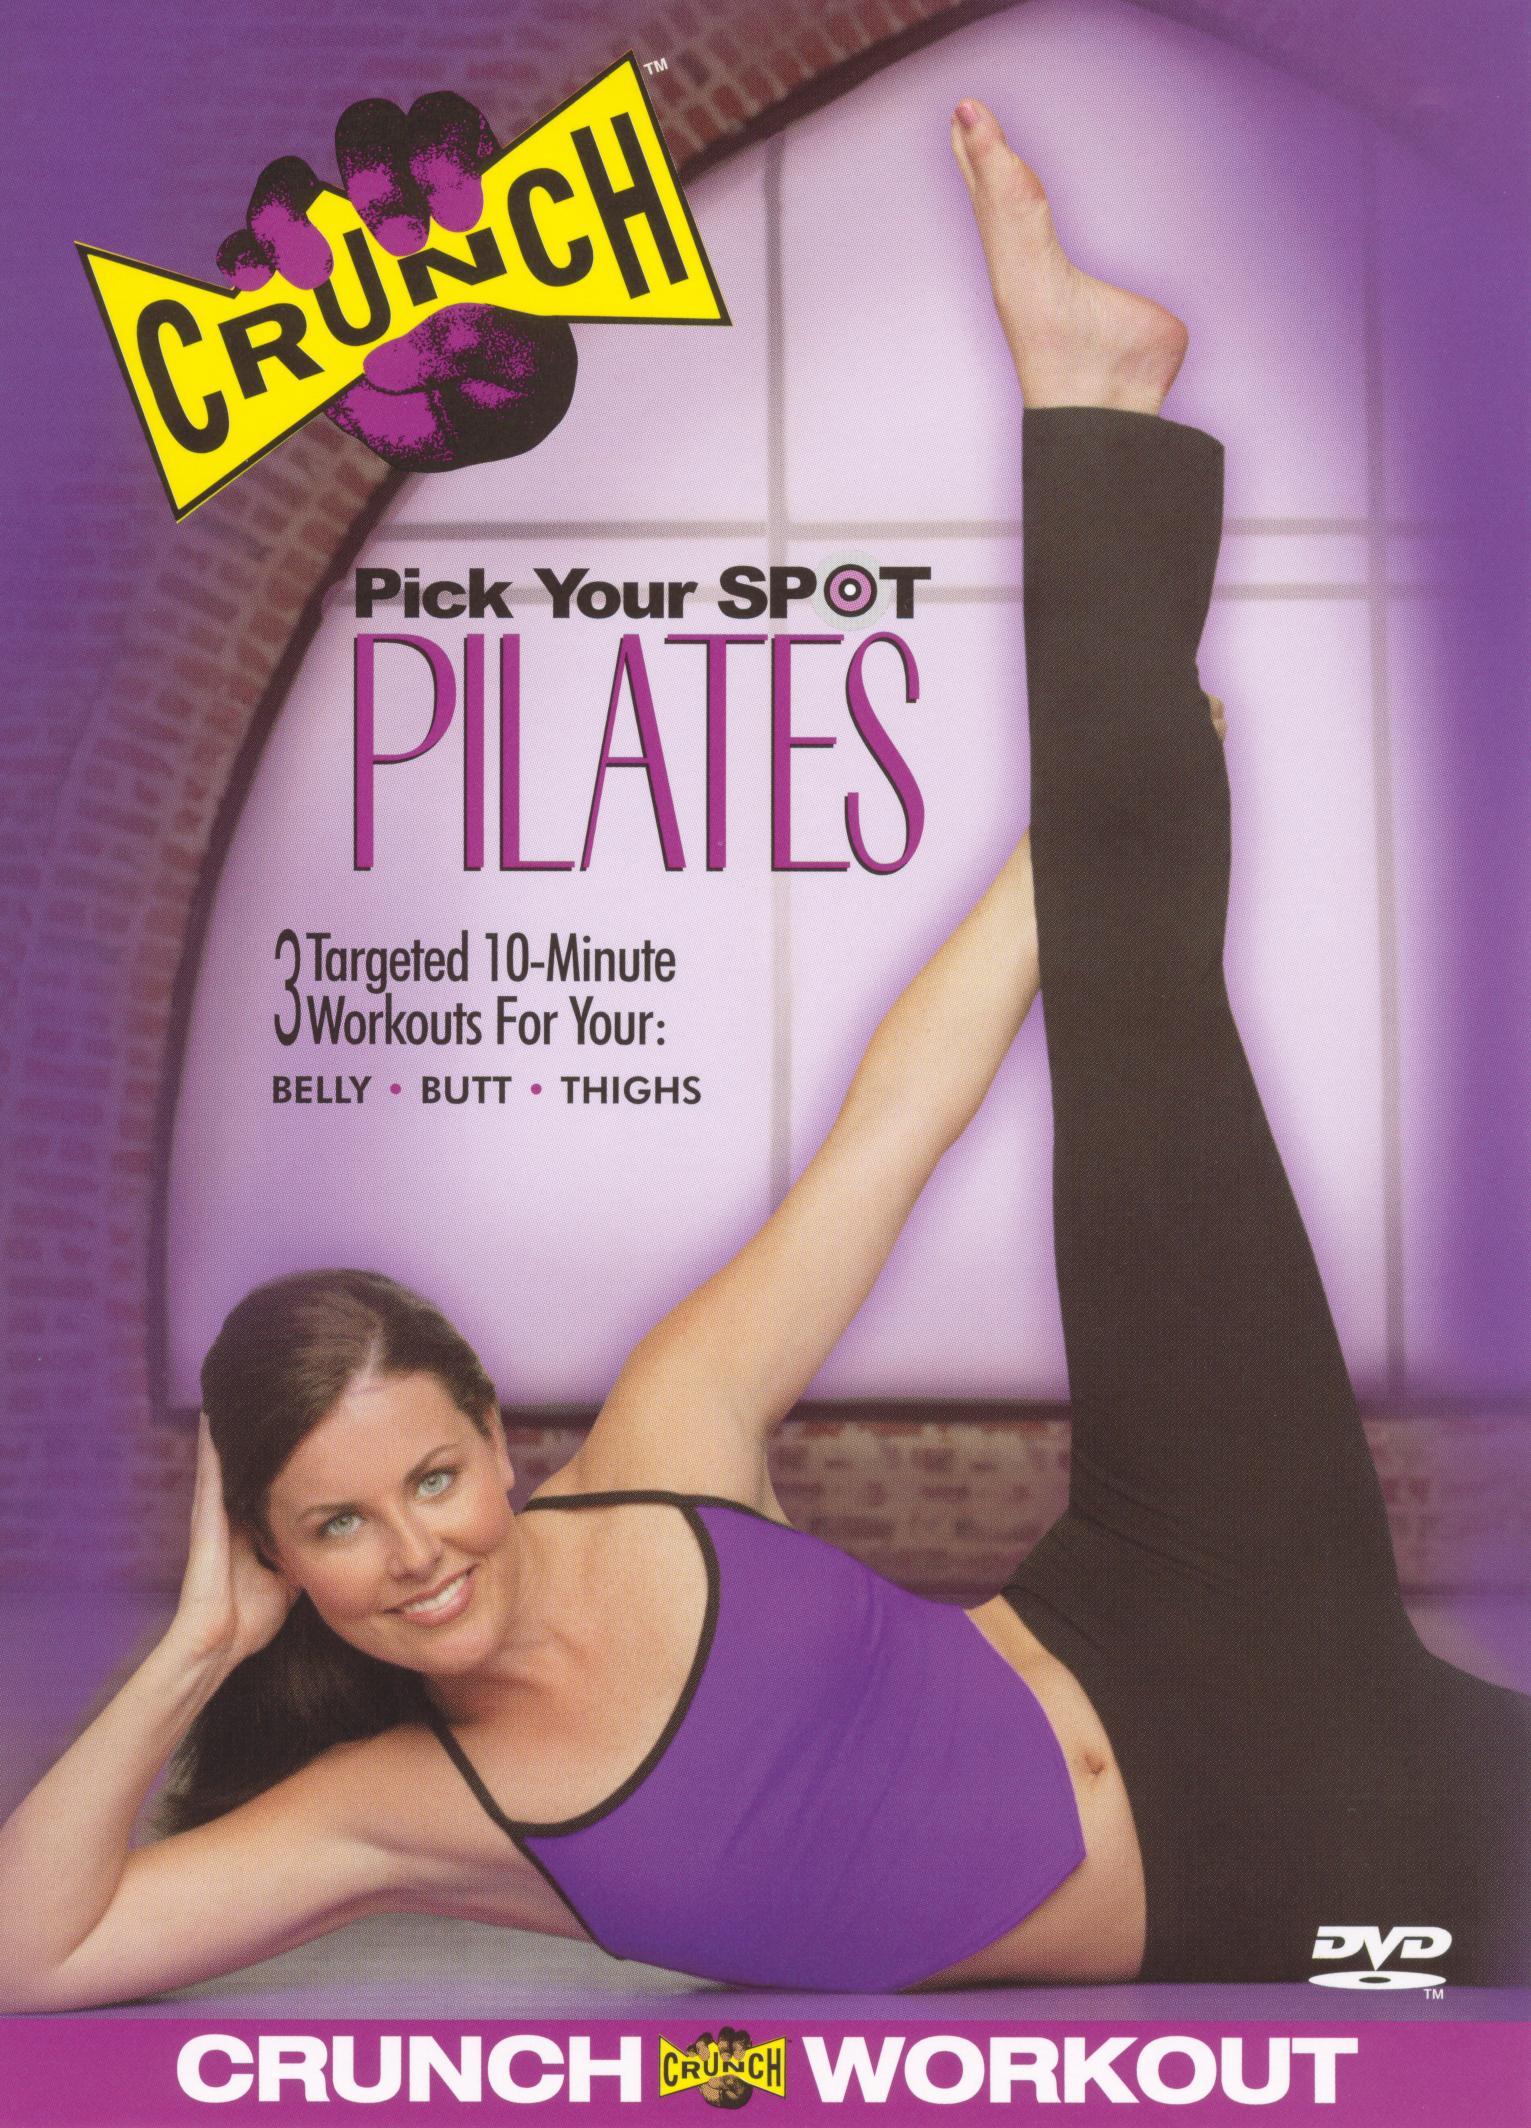 Crunch: Pick Your Spot Pilates